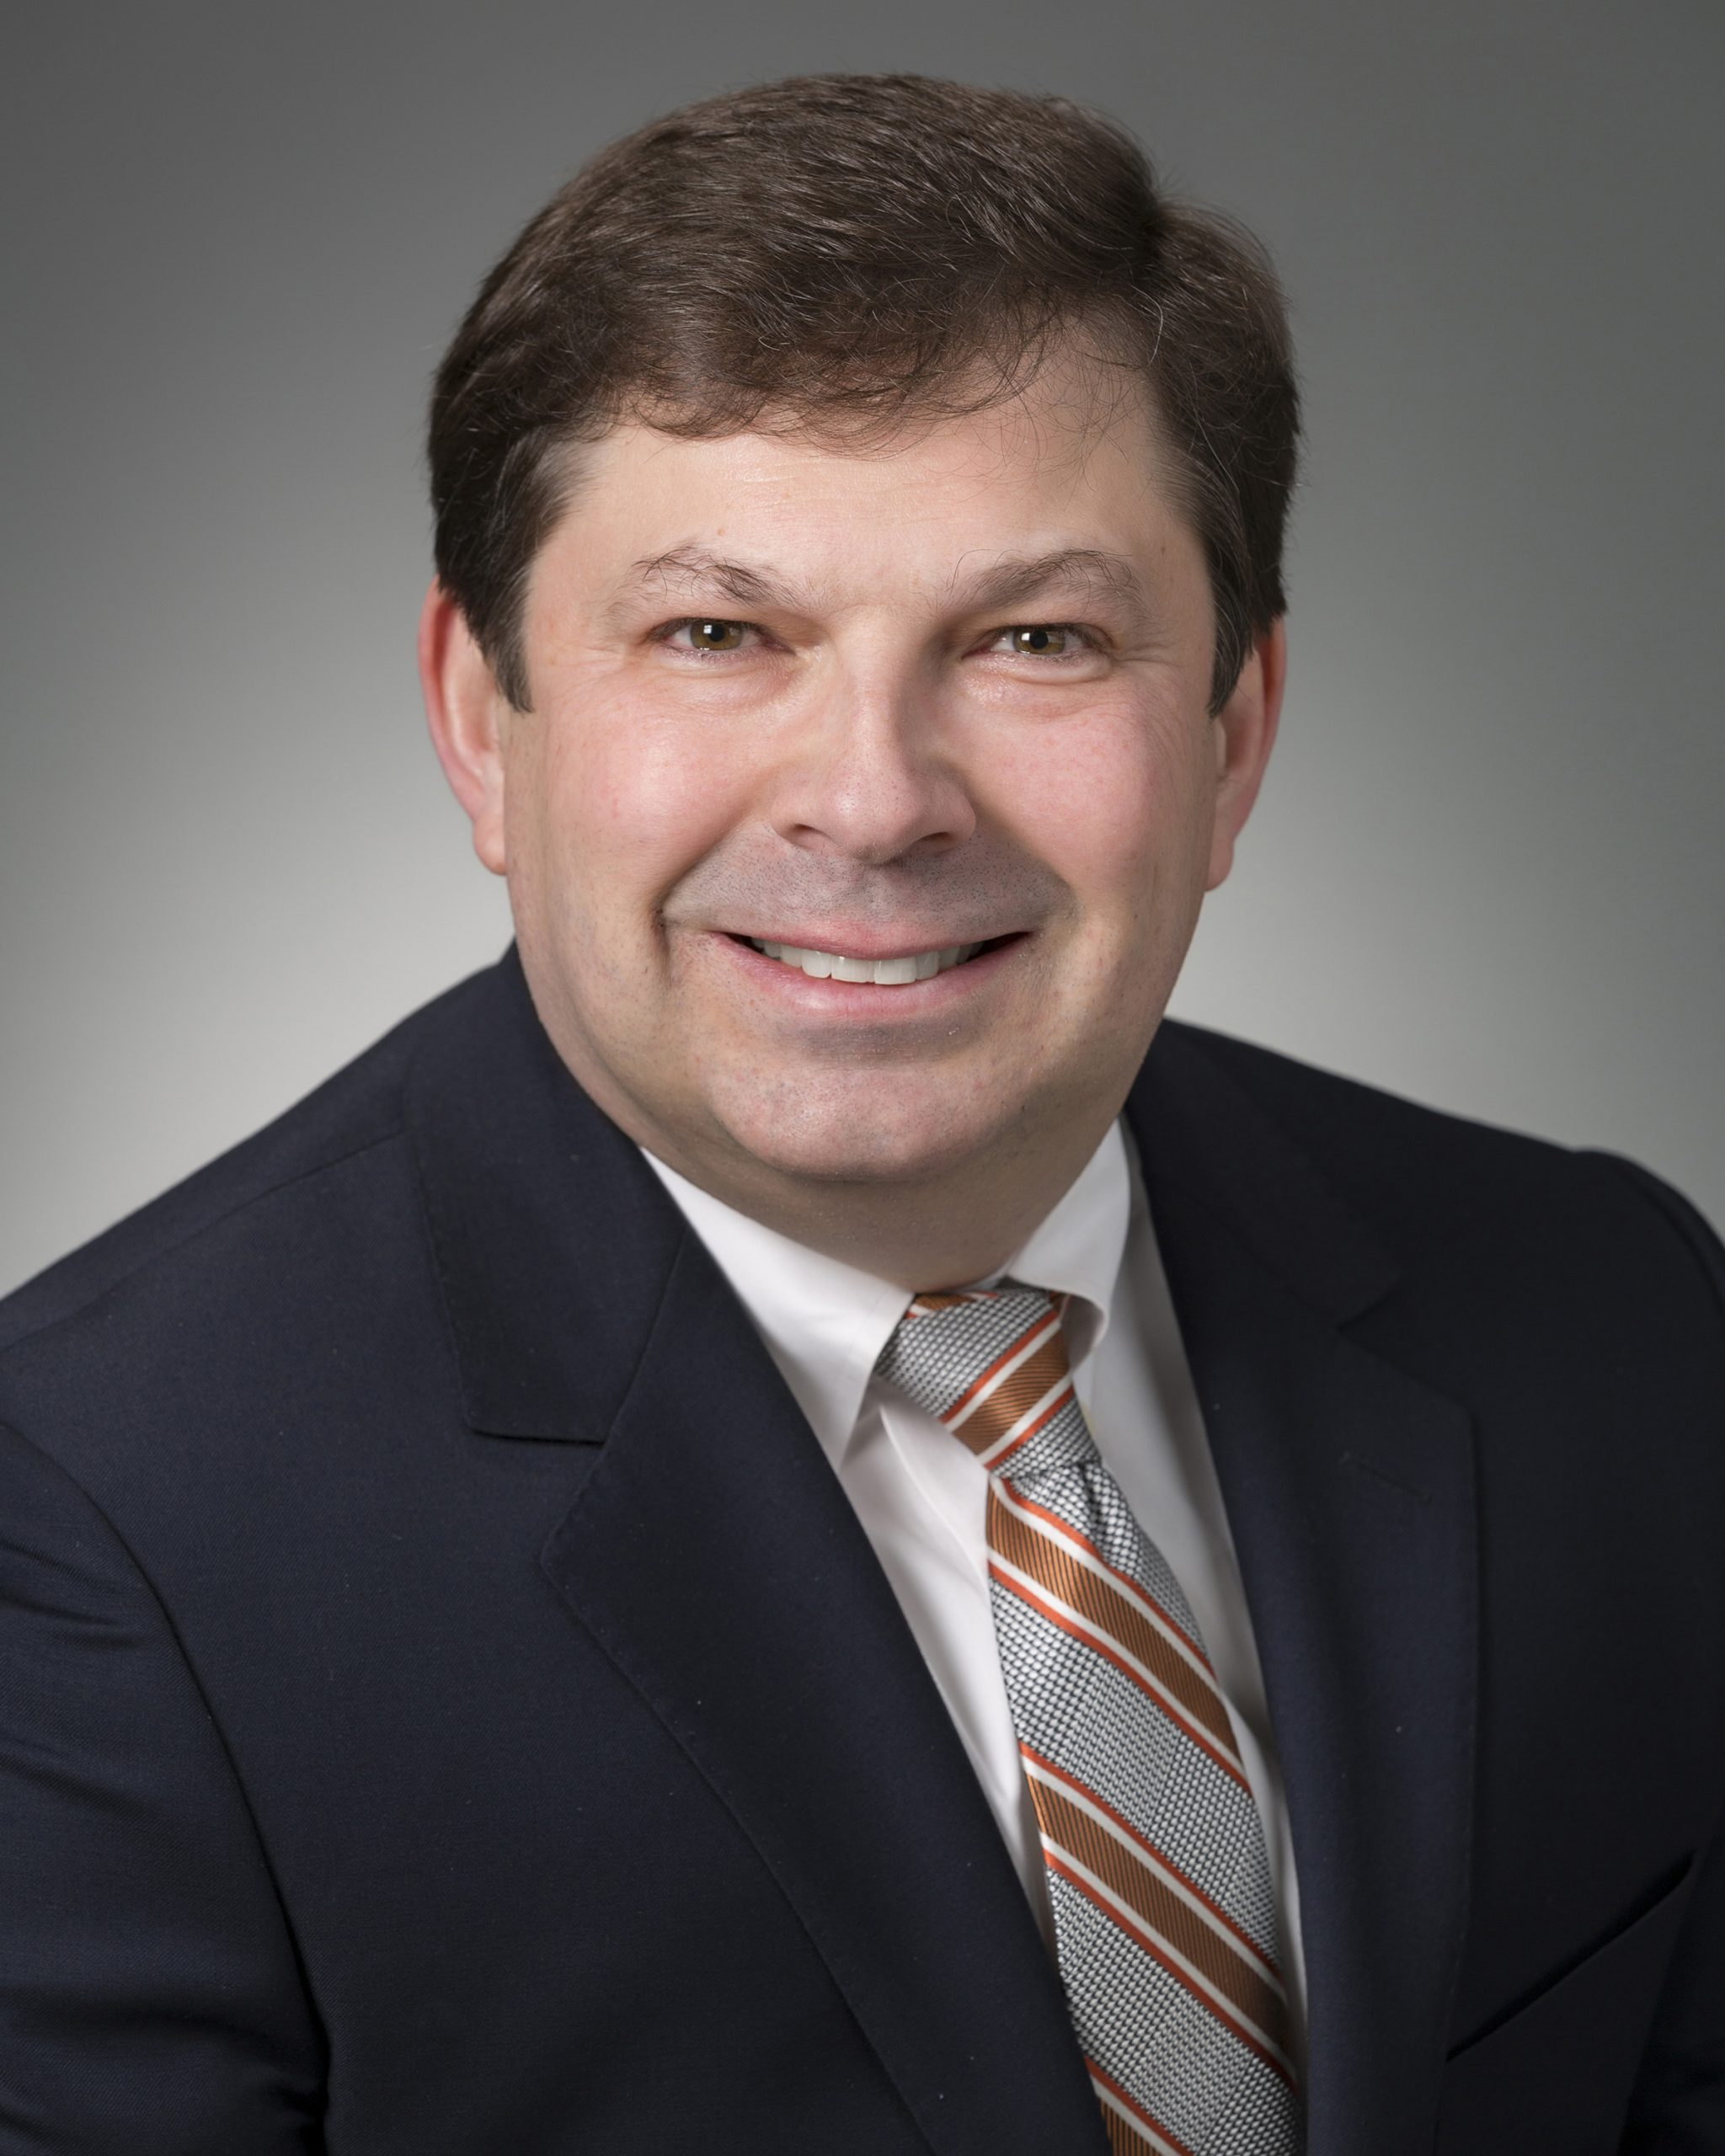 Robert Strauss, CFA